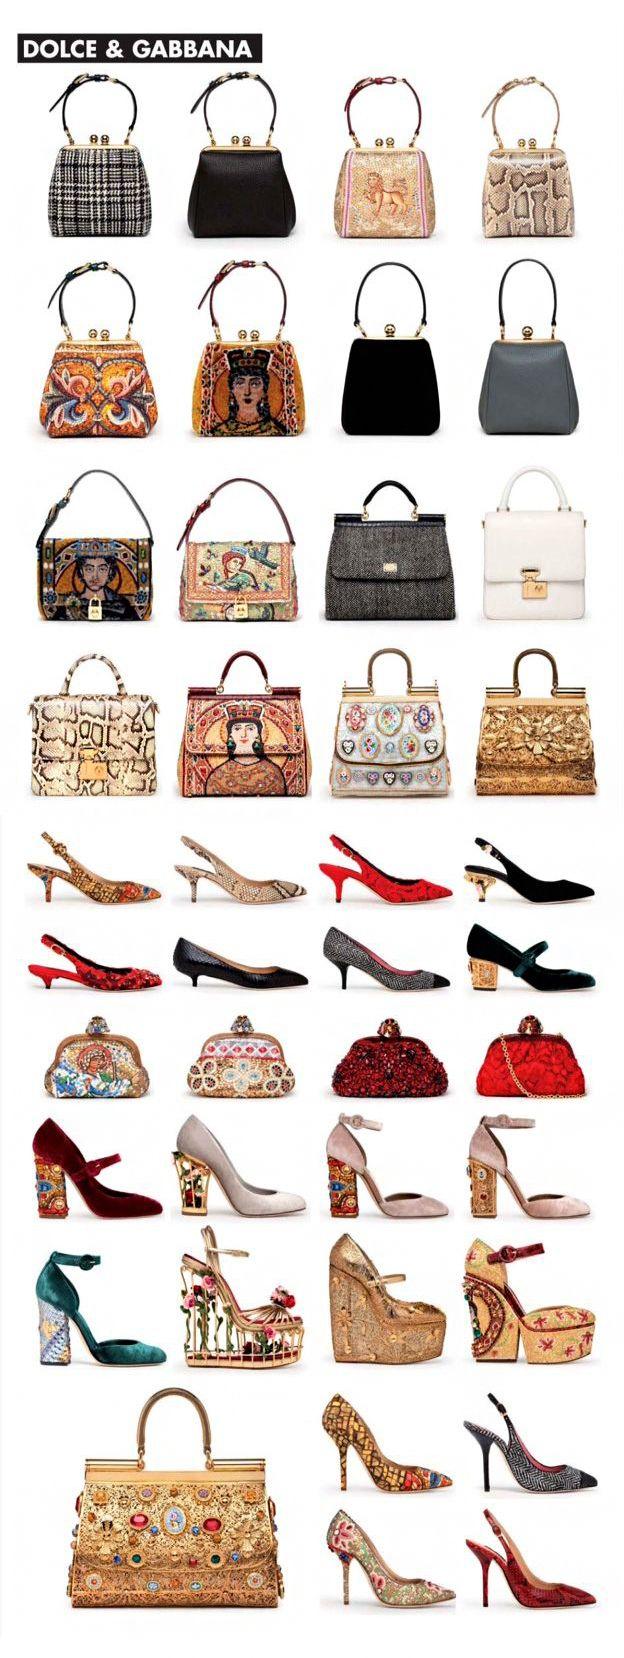 Dolce & Gabbana accessories a/w 2013 - I adore those handbags!